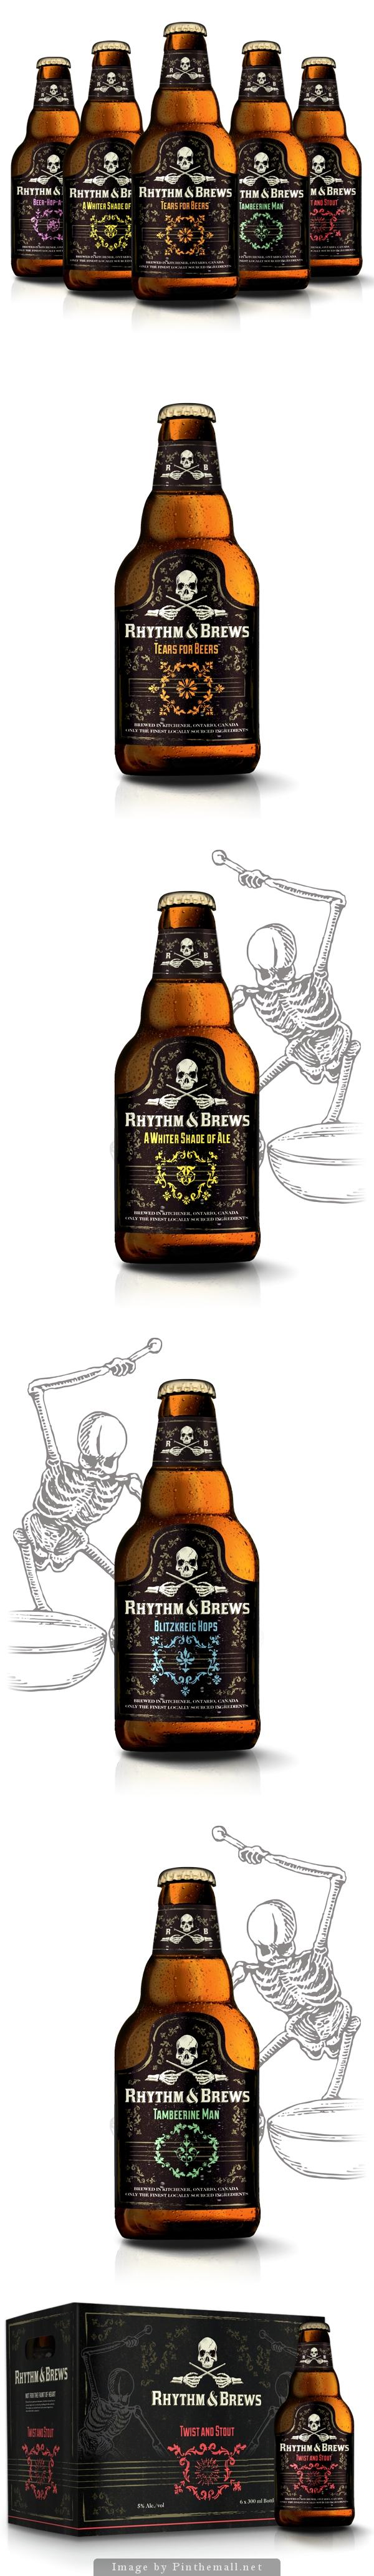 Rhythm & Brews by Tom Ralston PD